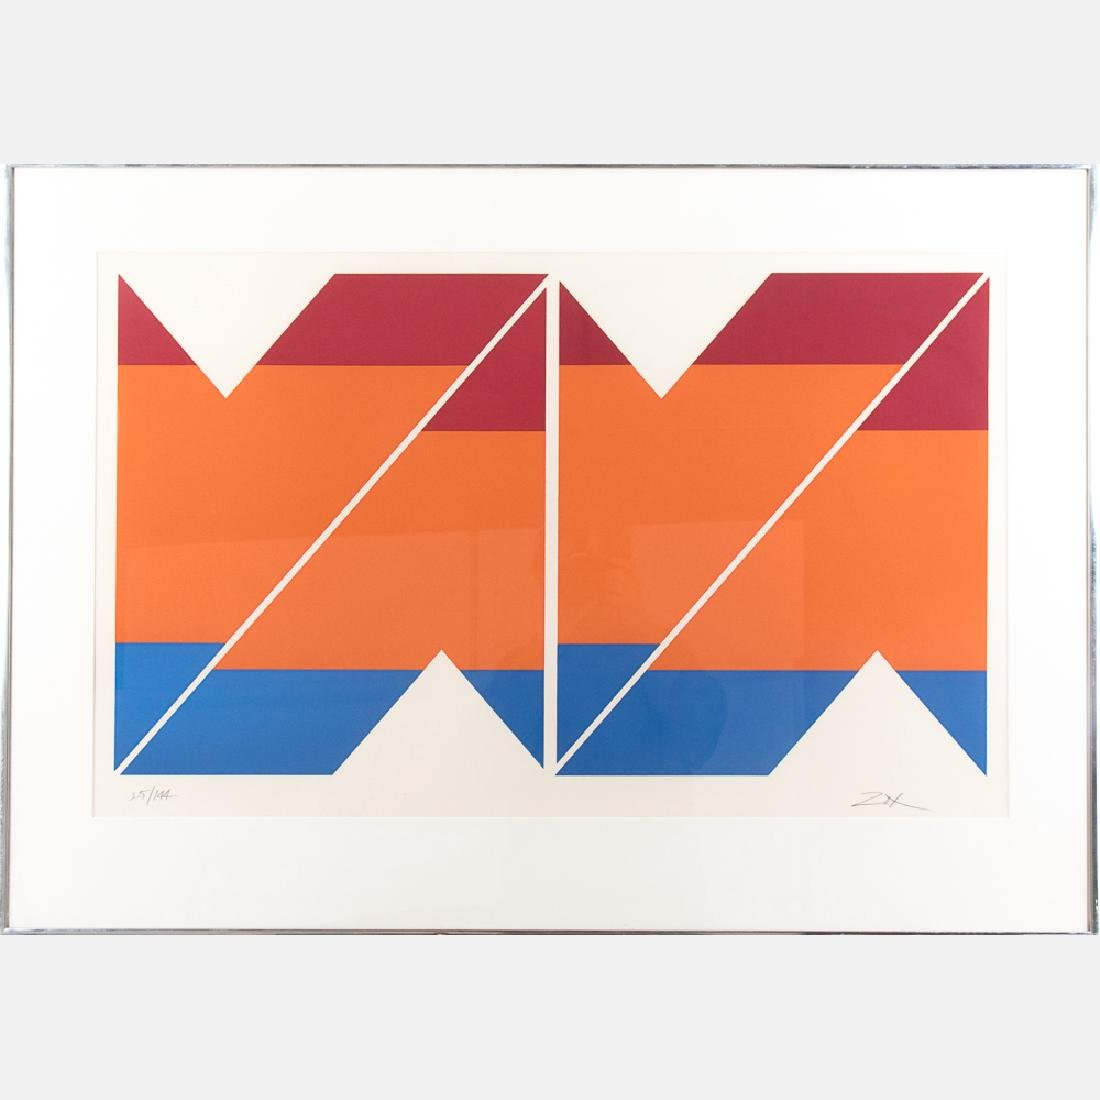 Larry Zox (1937-2006) Untitled, 1971, Silkscreen,